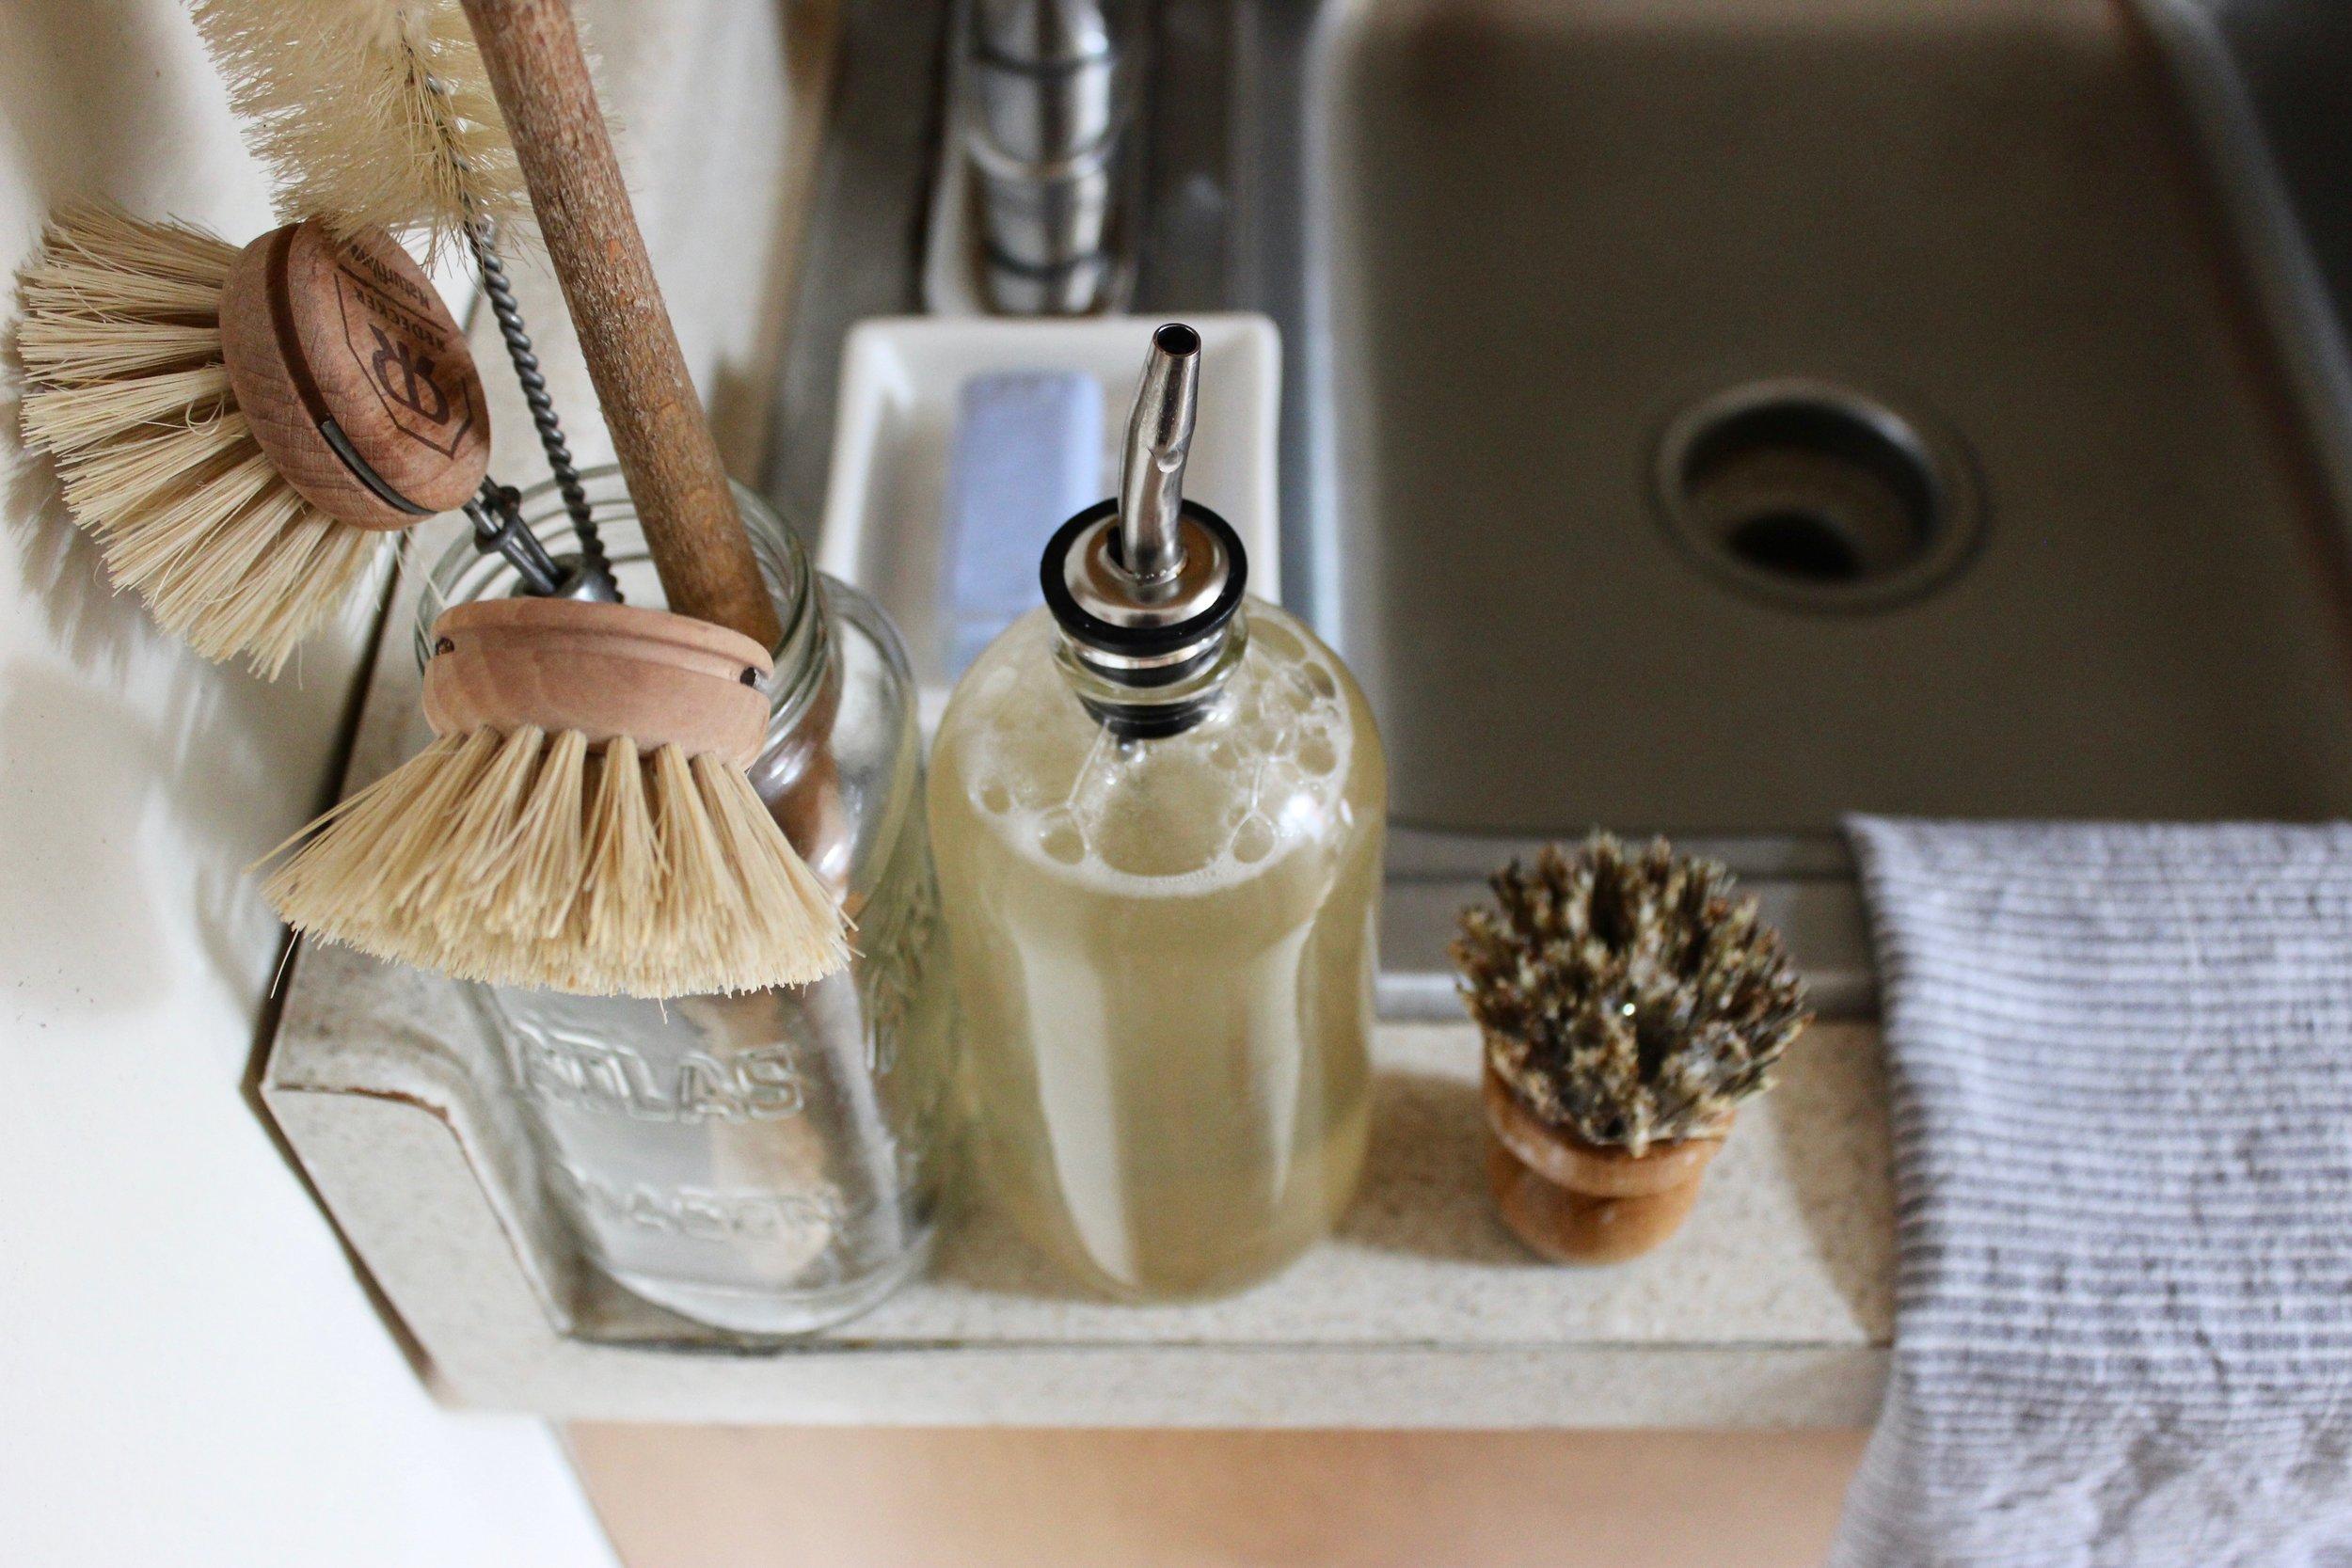 Zero waste dishwashing and dish soap | Litterless